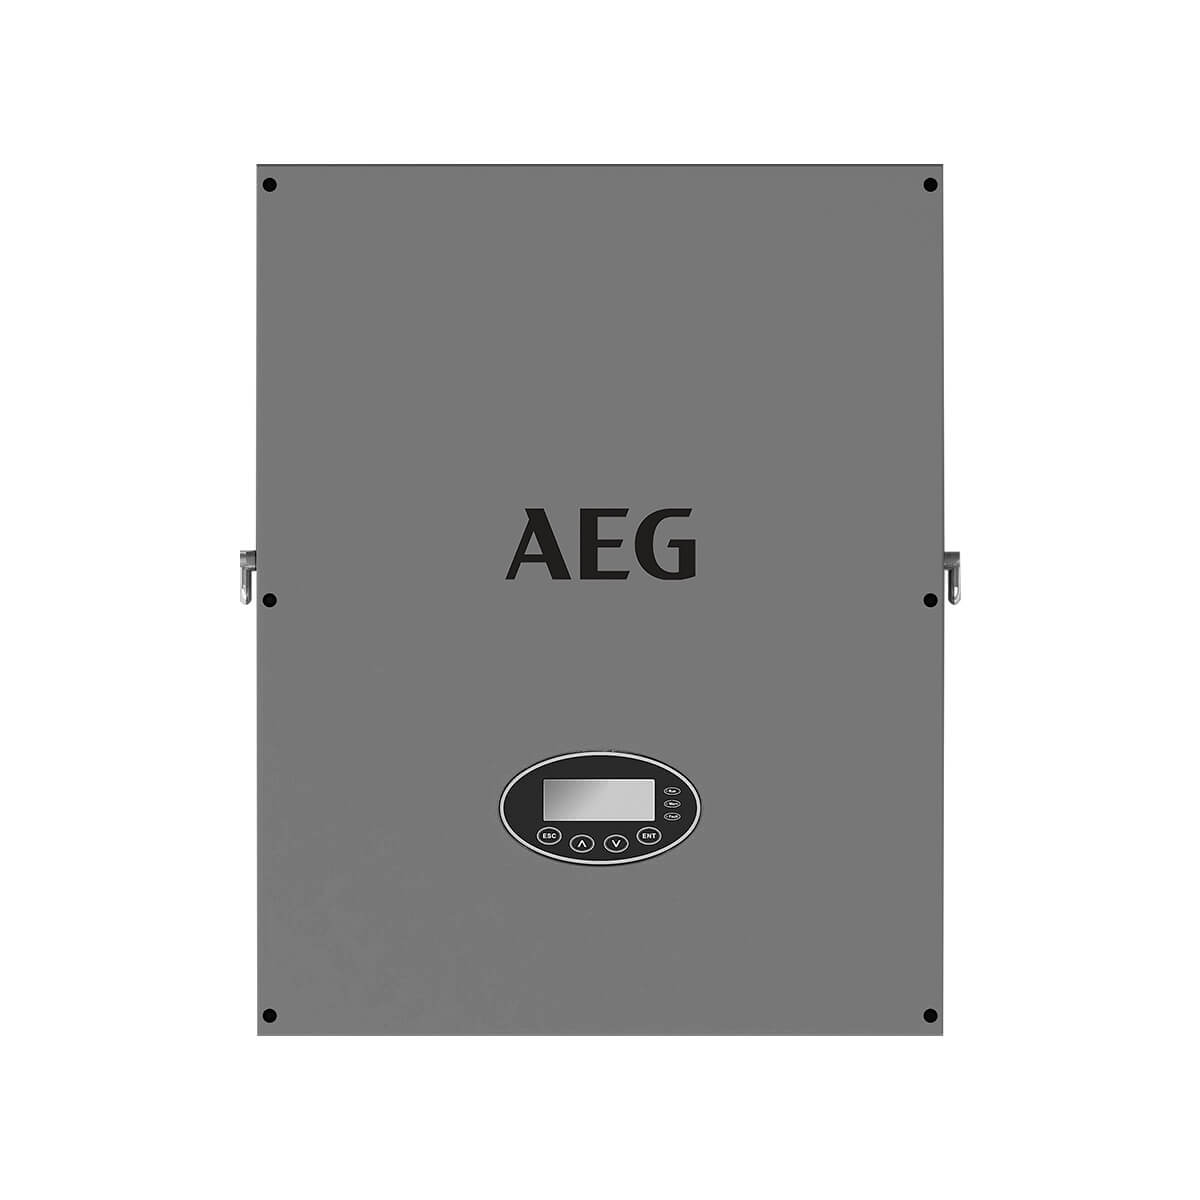 aeg 40kW inverter, aeg as-ic01 40kW inverter, aeg as-ic01-40000-2 inverter, aeg as-ic01-40000-2, aeg as-ic01 40kW